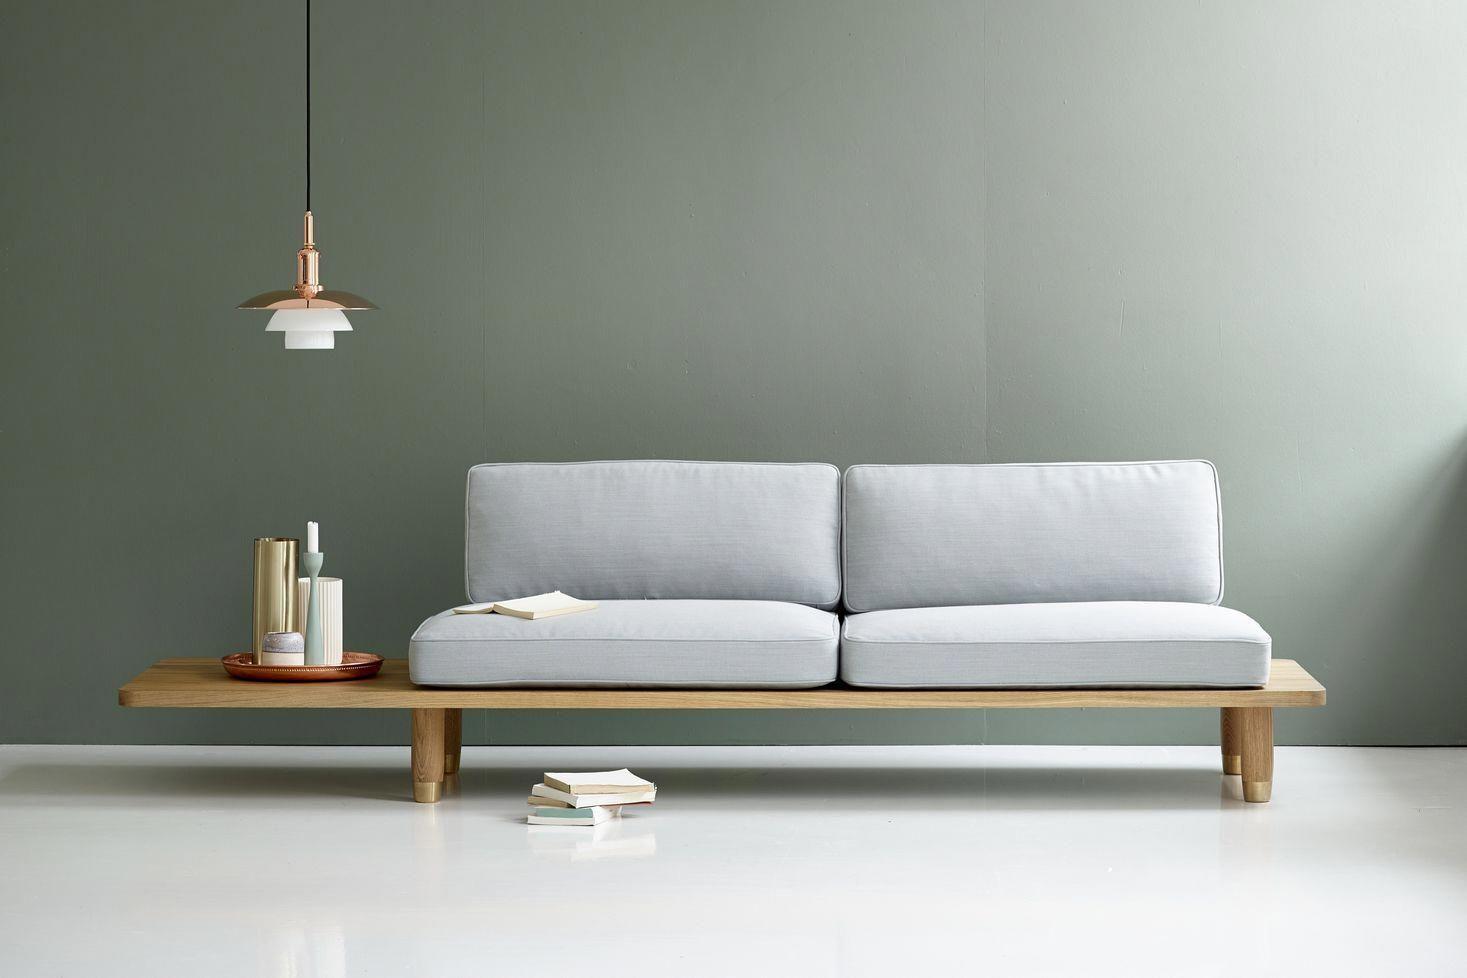 Plank Sofa Fabric Design By Knudsen Berg Hindenes Myhr Dk3 Furnituredesign Modern Sofa Designs Diy Sofa Diy Couch